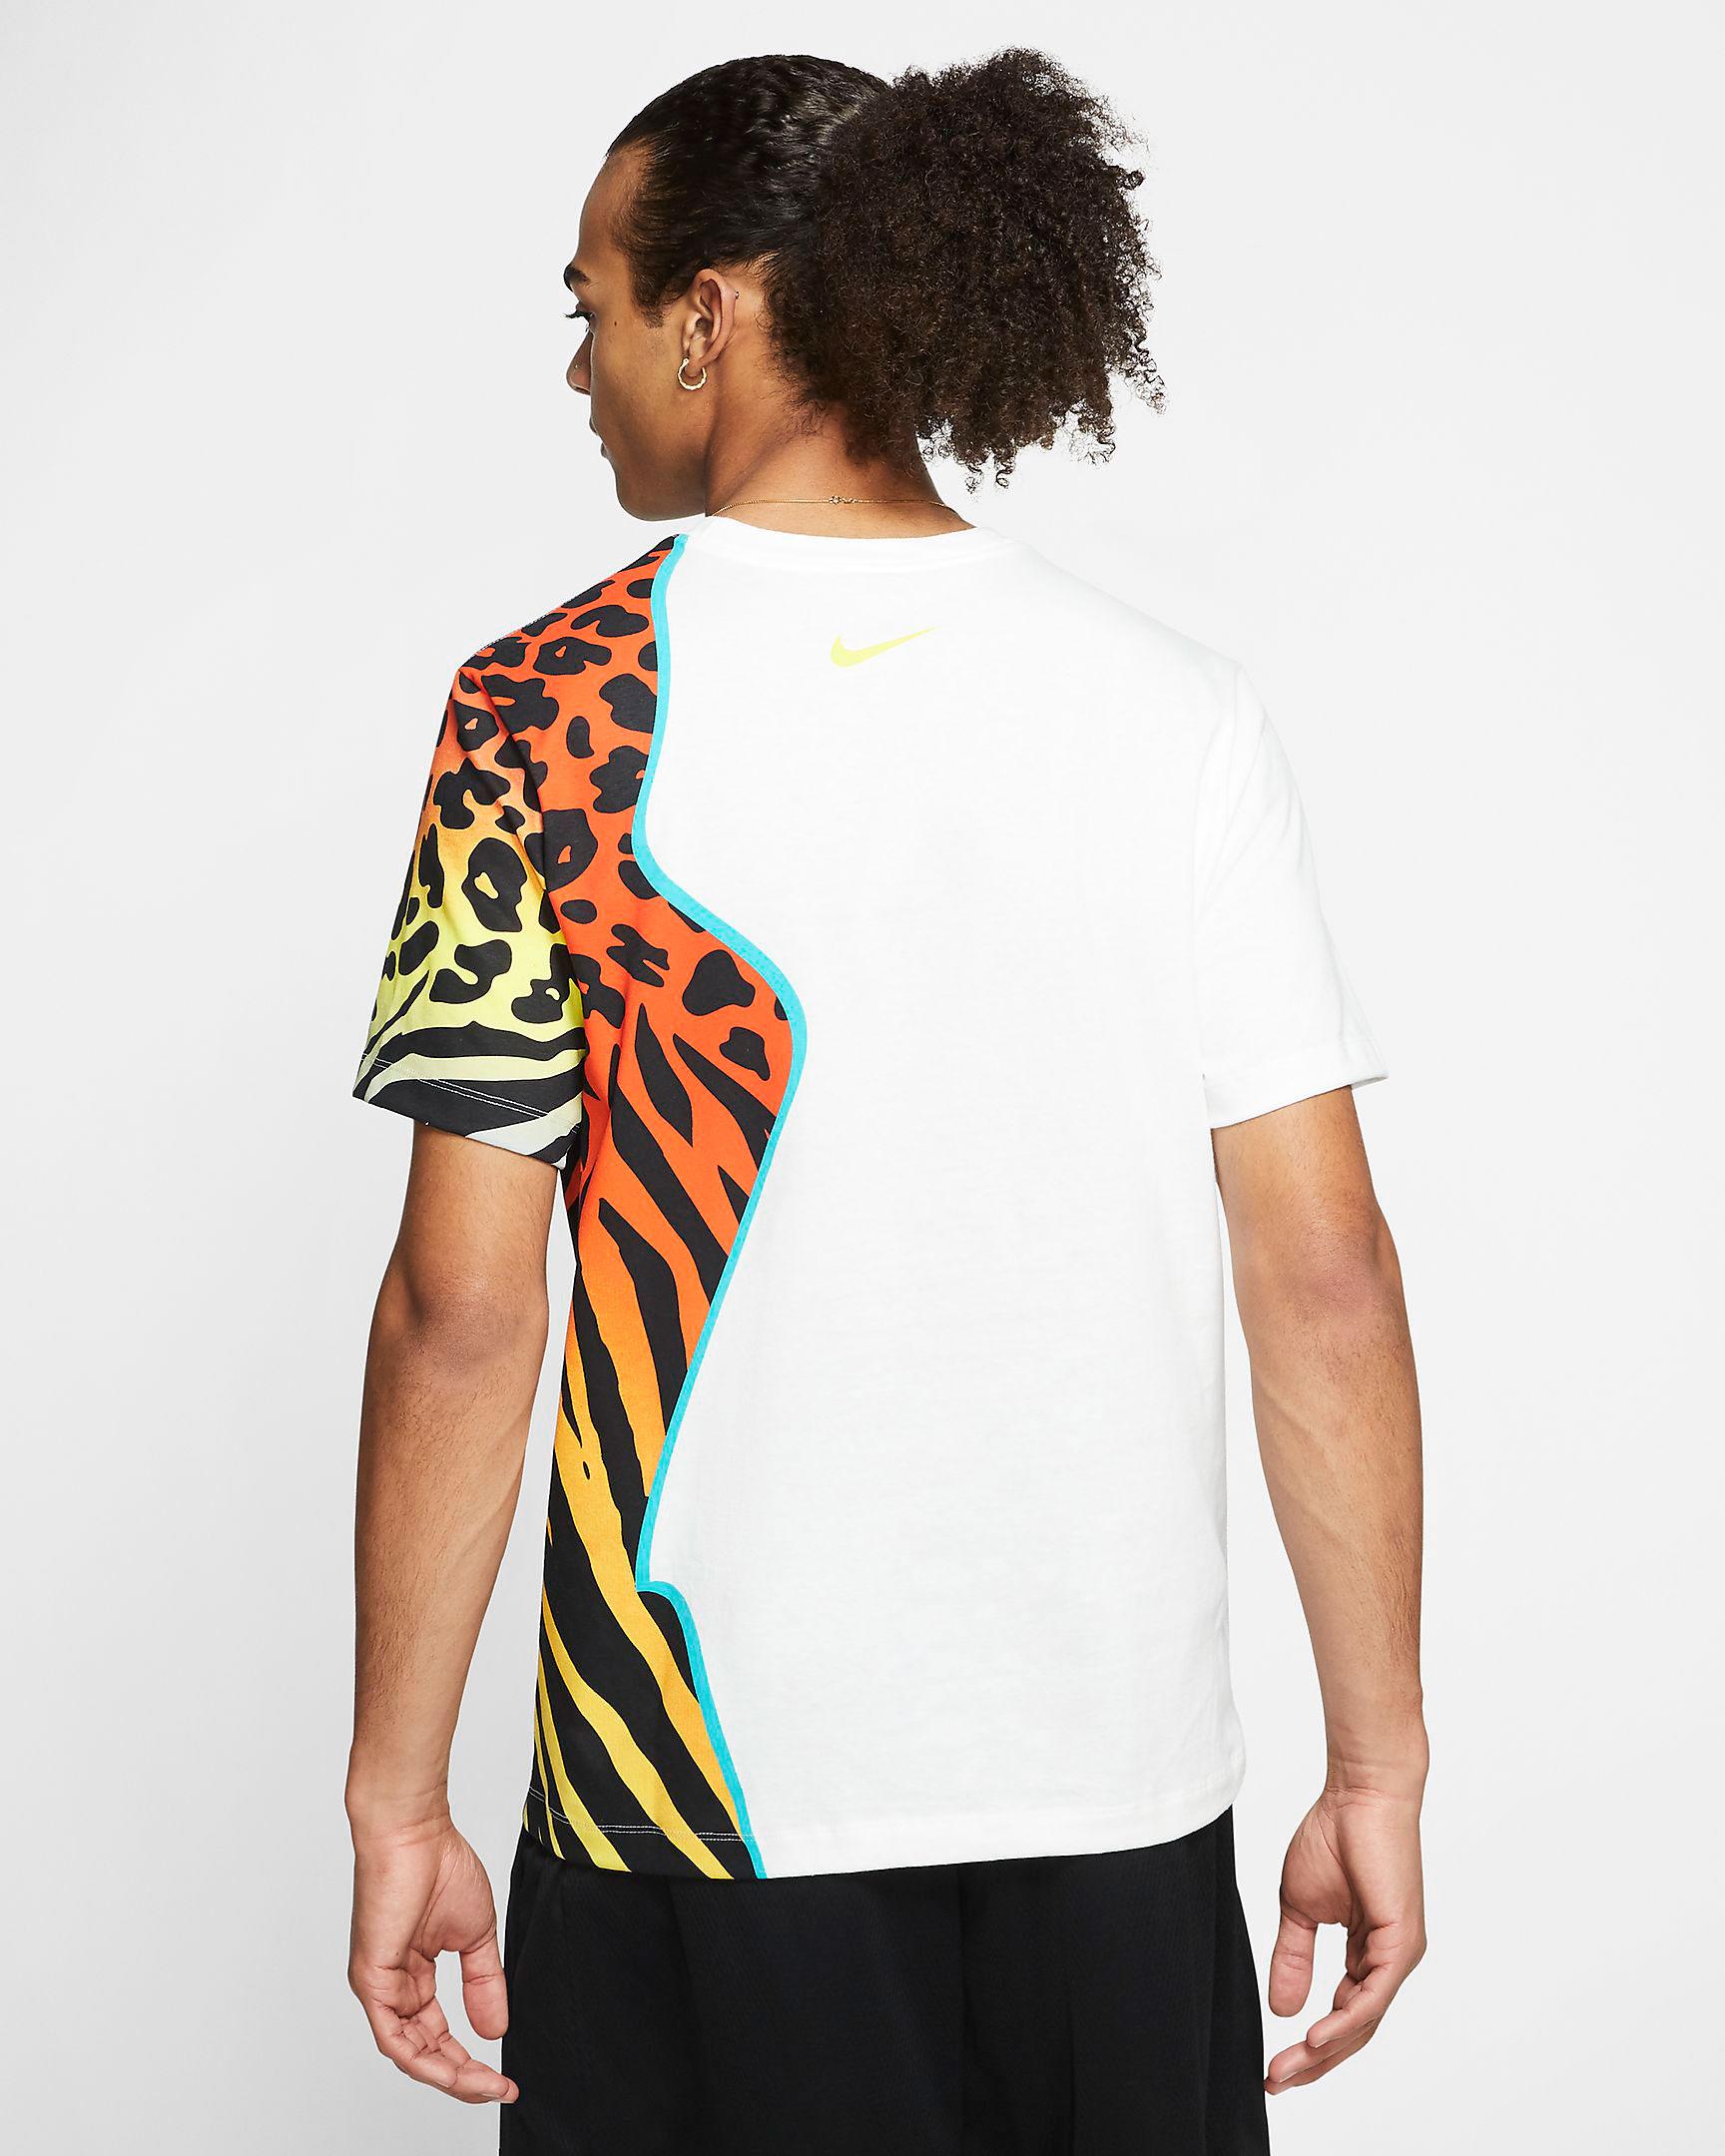 nike-kyrie-6-oracle-aqua-animal-shirt-white-4